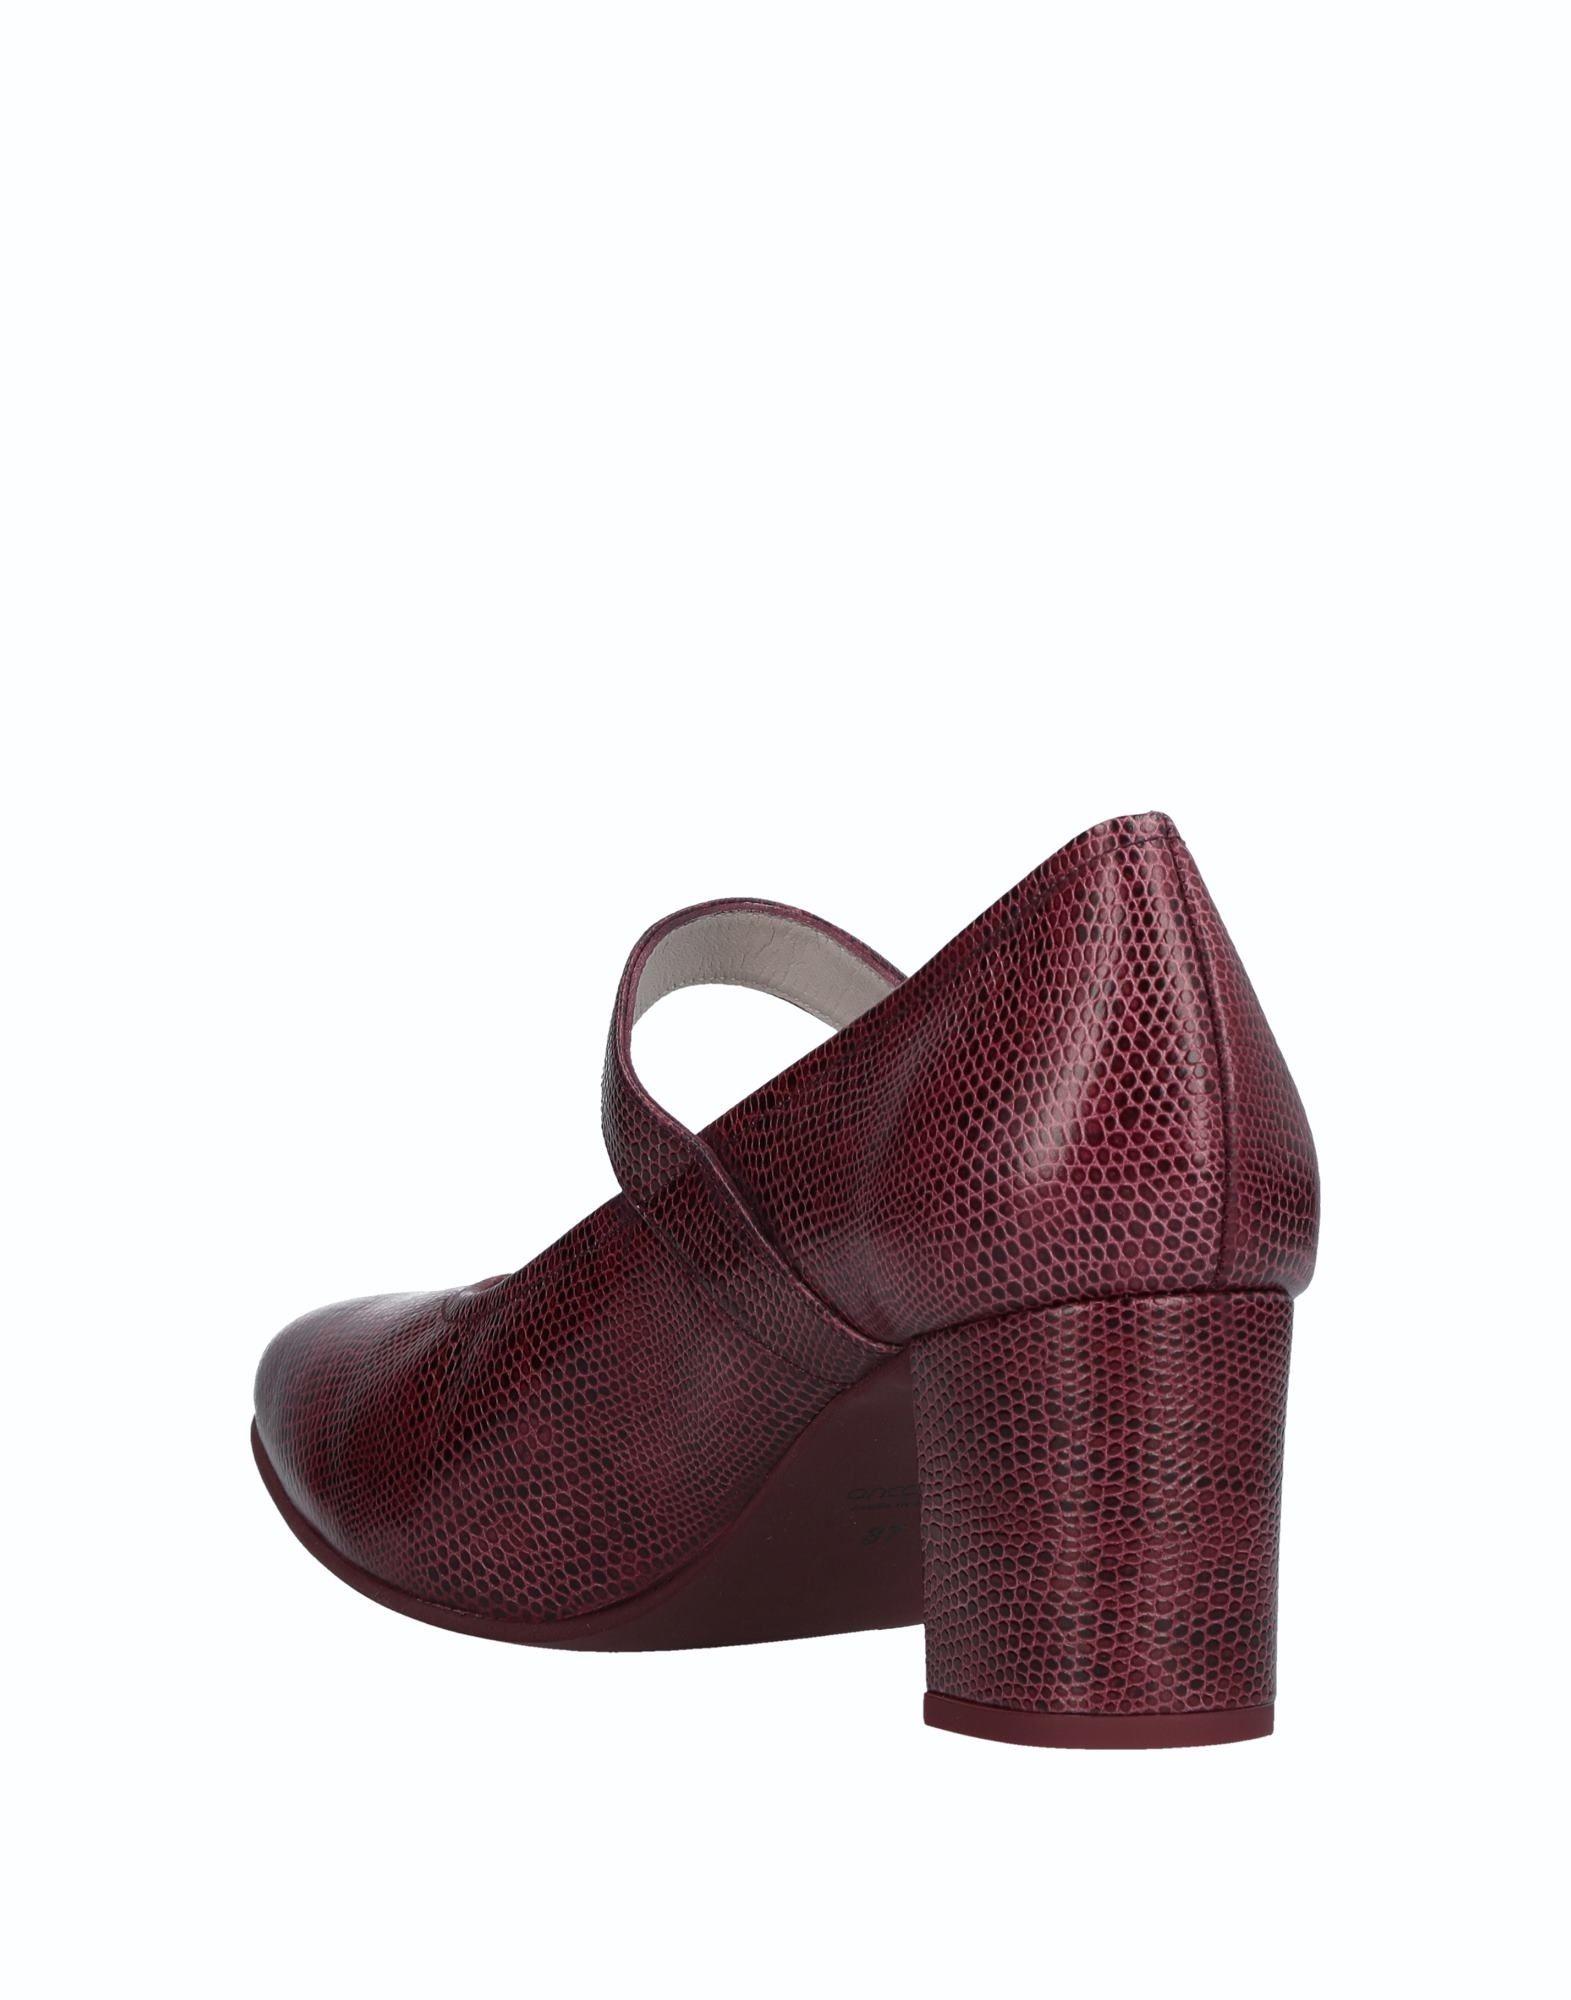 Ancarani Gute Pumps Damen  11515554WE Gute Ancarani Qualität beliebte Schuhe 8e6e56